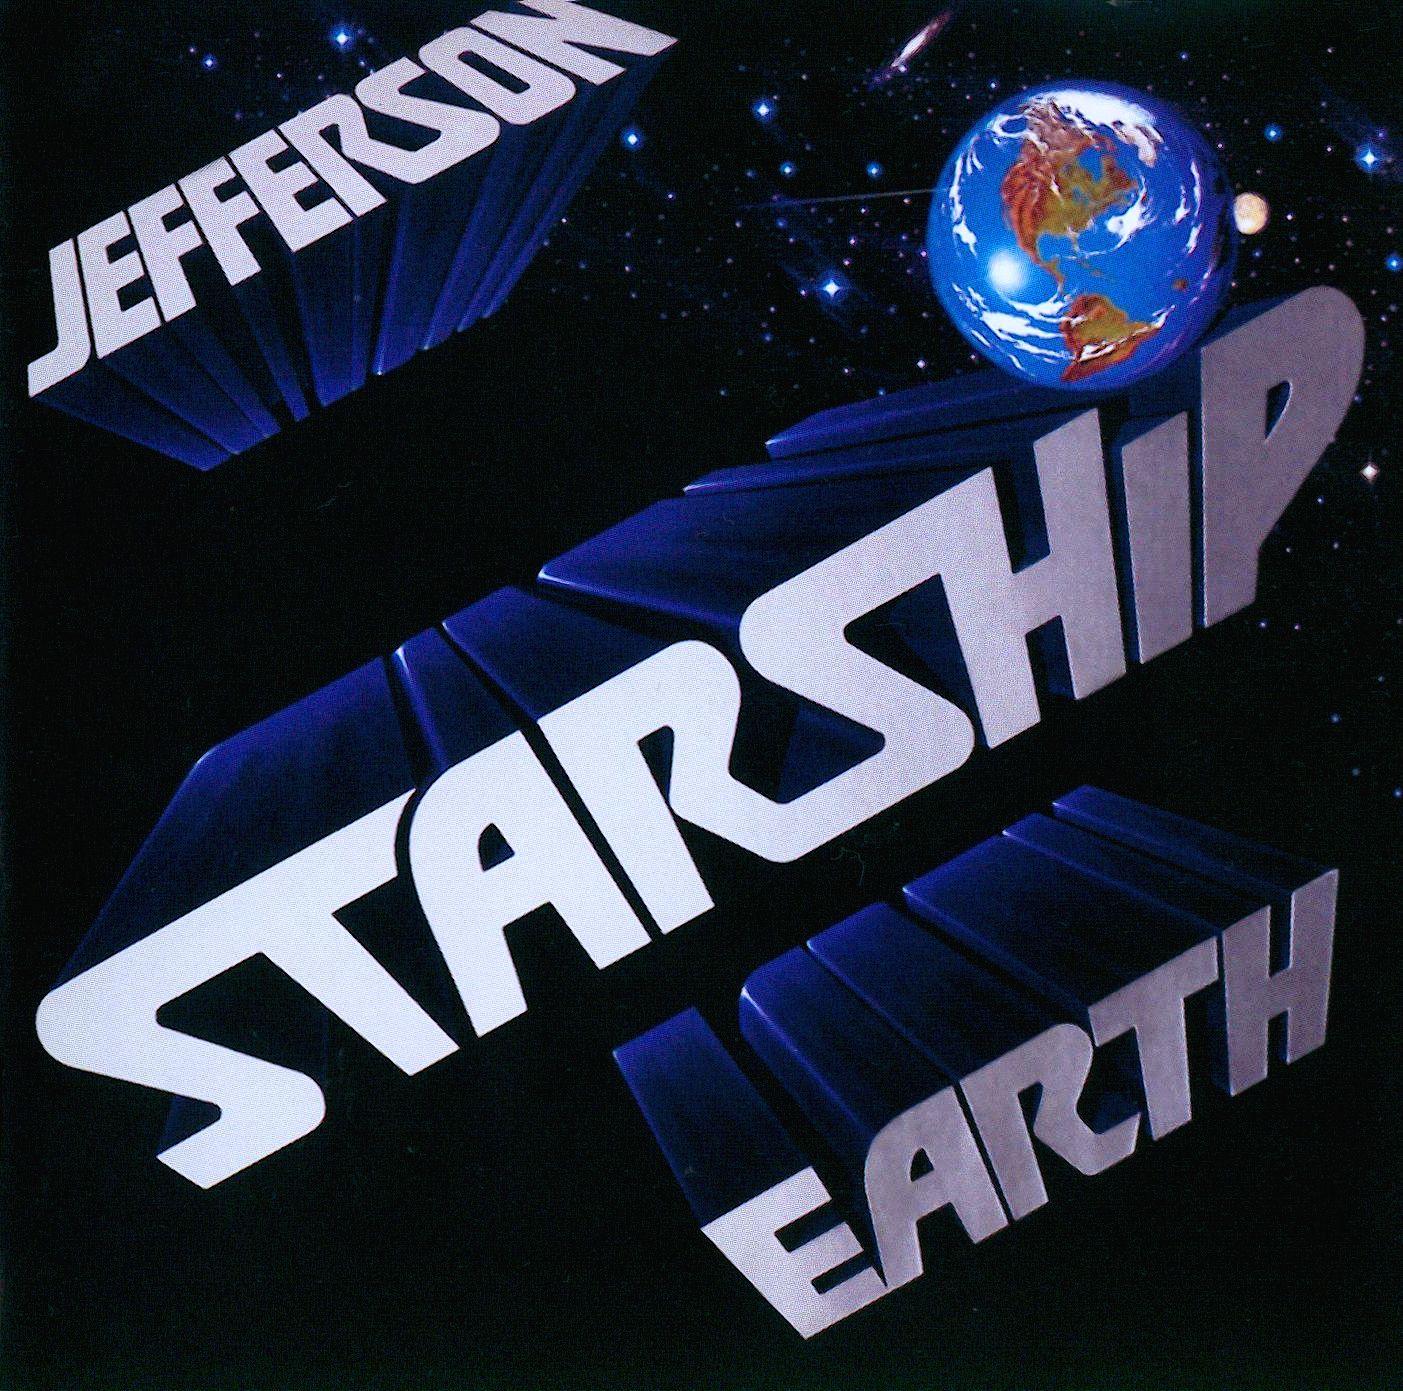 JEFFERSON STARSHIP DISCOGRAPHY (free listening, free sharing) : EL MUNDO DE WILLIAM GUZMu00c1N